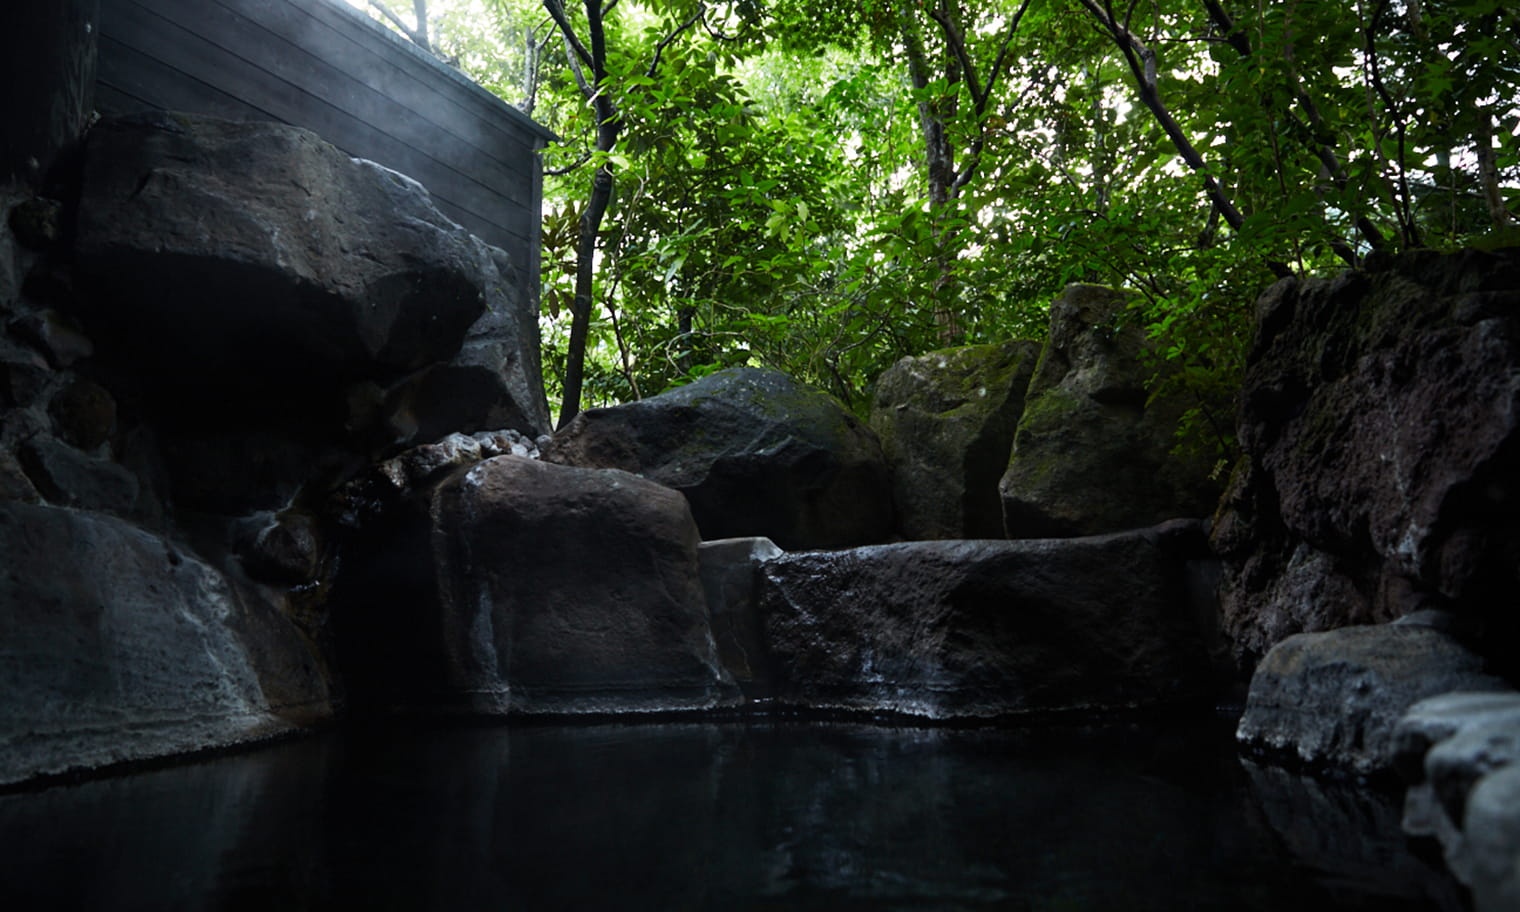 草庵秋桜 露天風呂付き客室